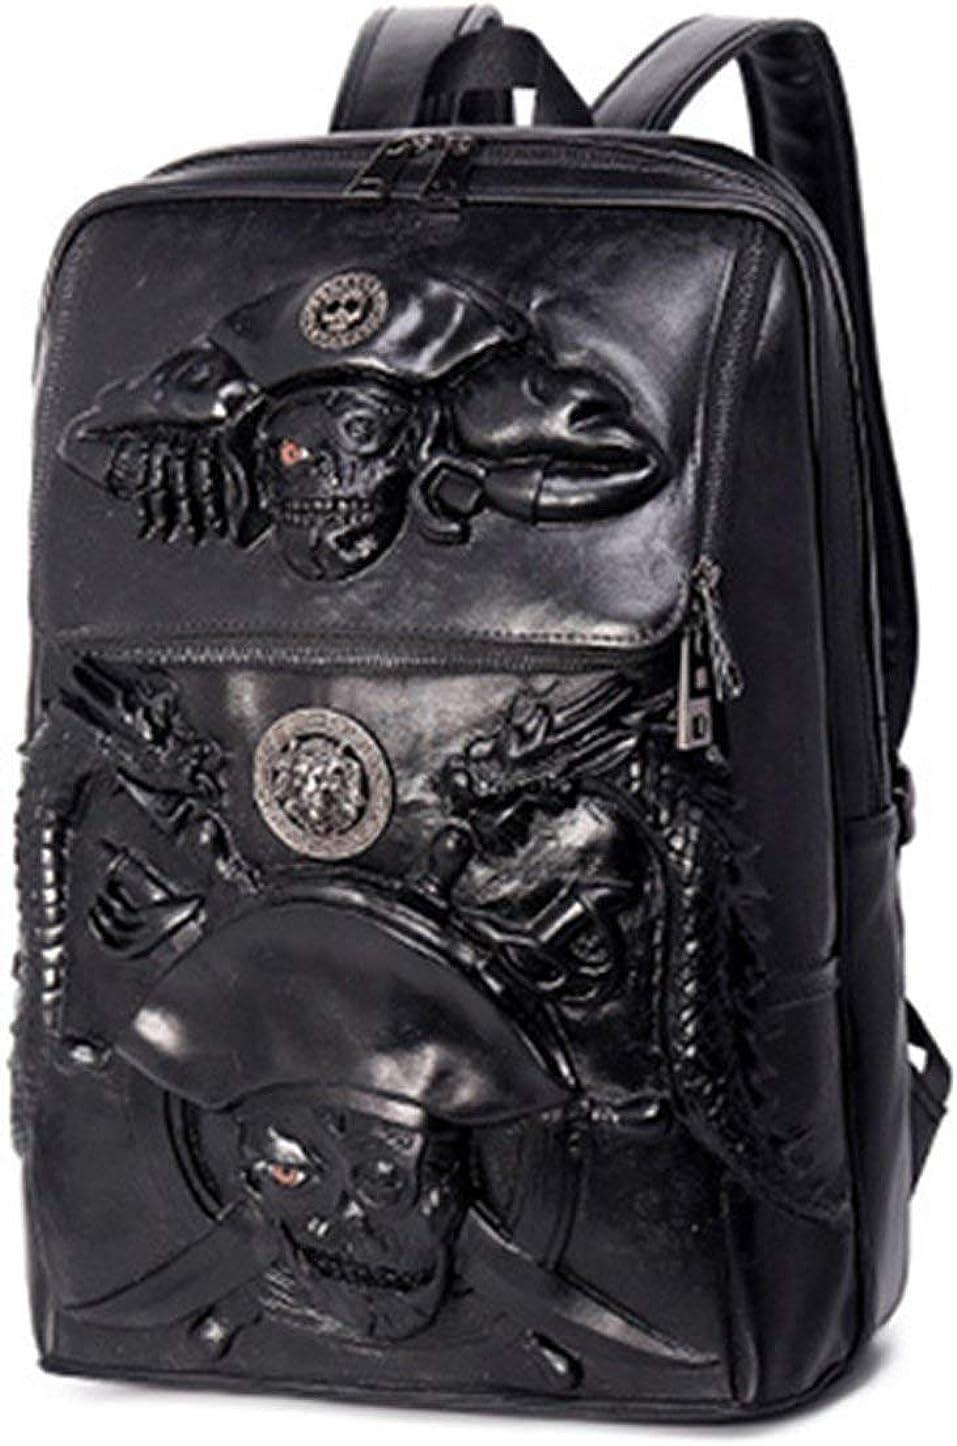 Halloween Skull Backpack 3D Pirate Captain 14Laptop Computer Handbags Knapsack For Teenager